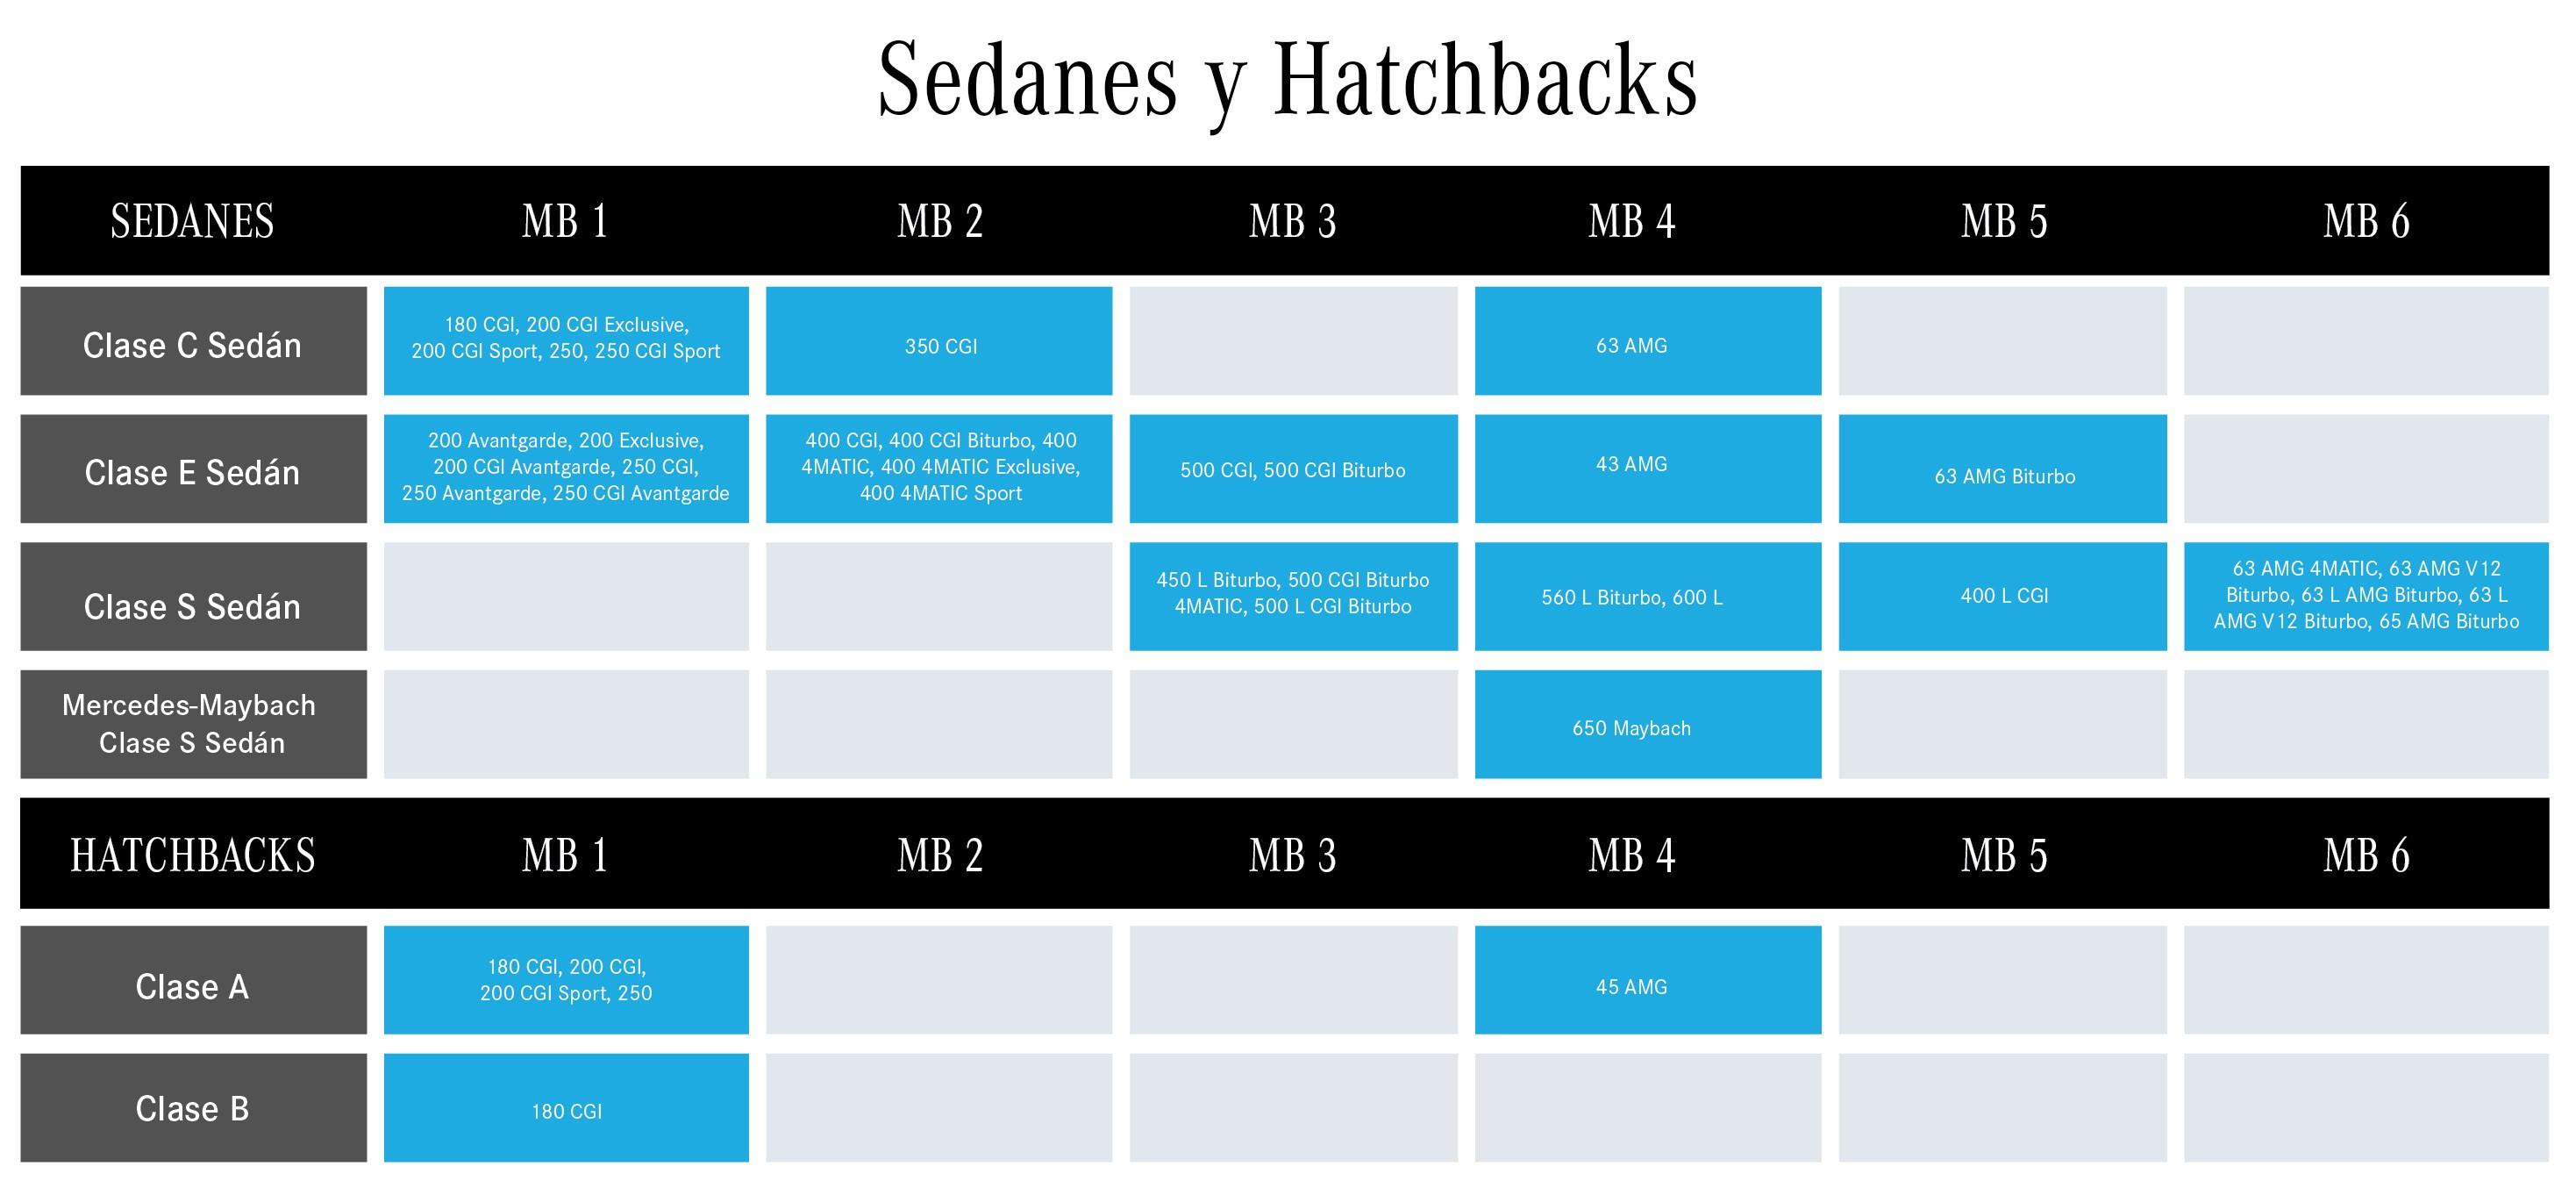 SEDANES Y HATCHBACK